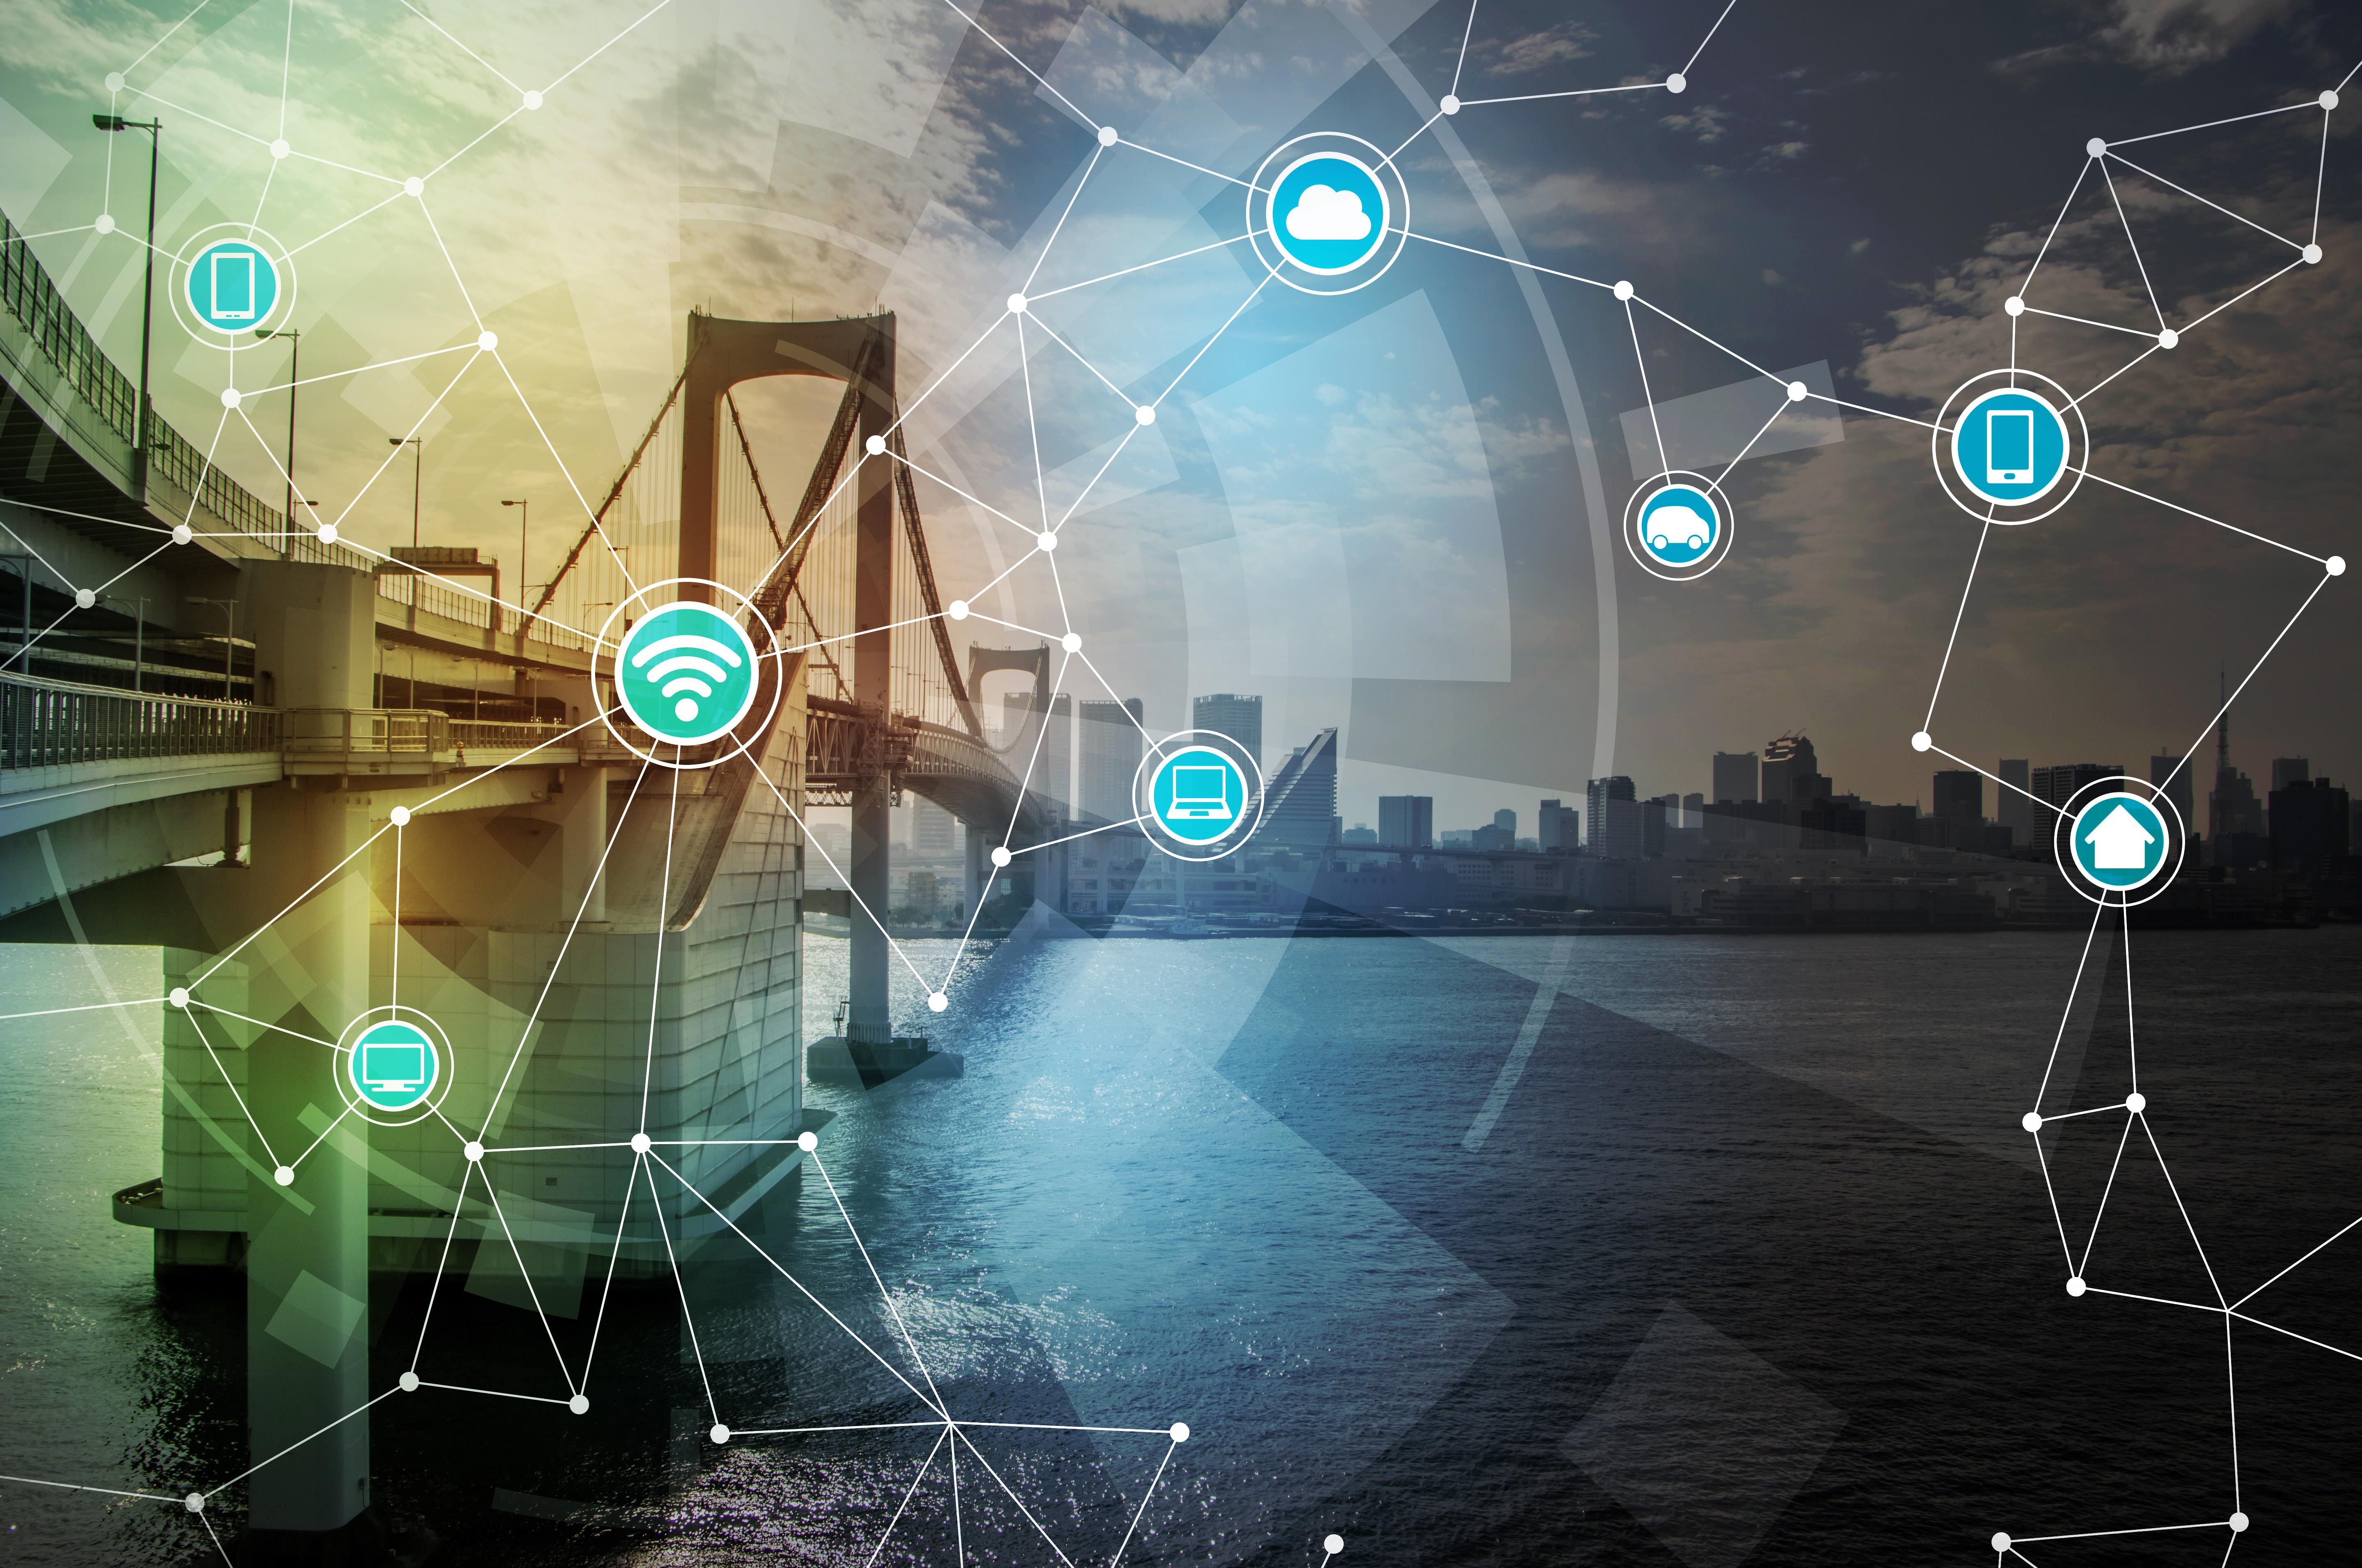 smart city and bridge, wireless communication network, internet of things